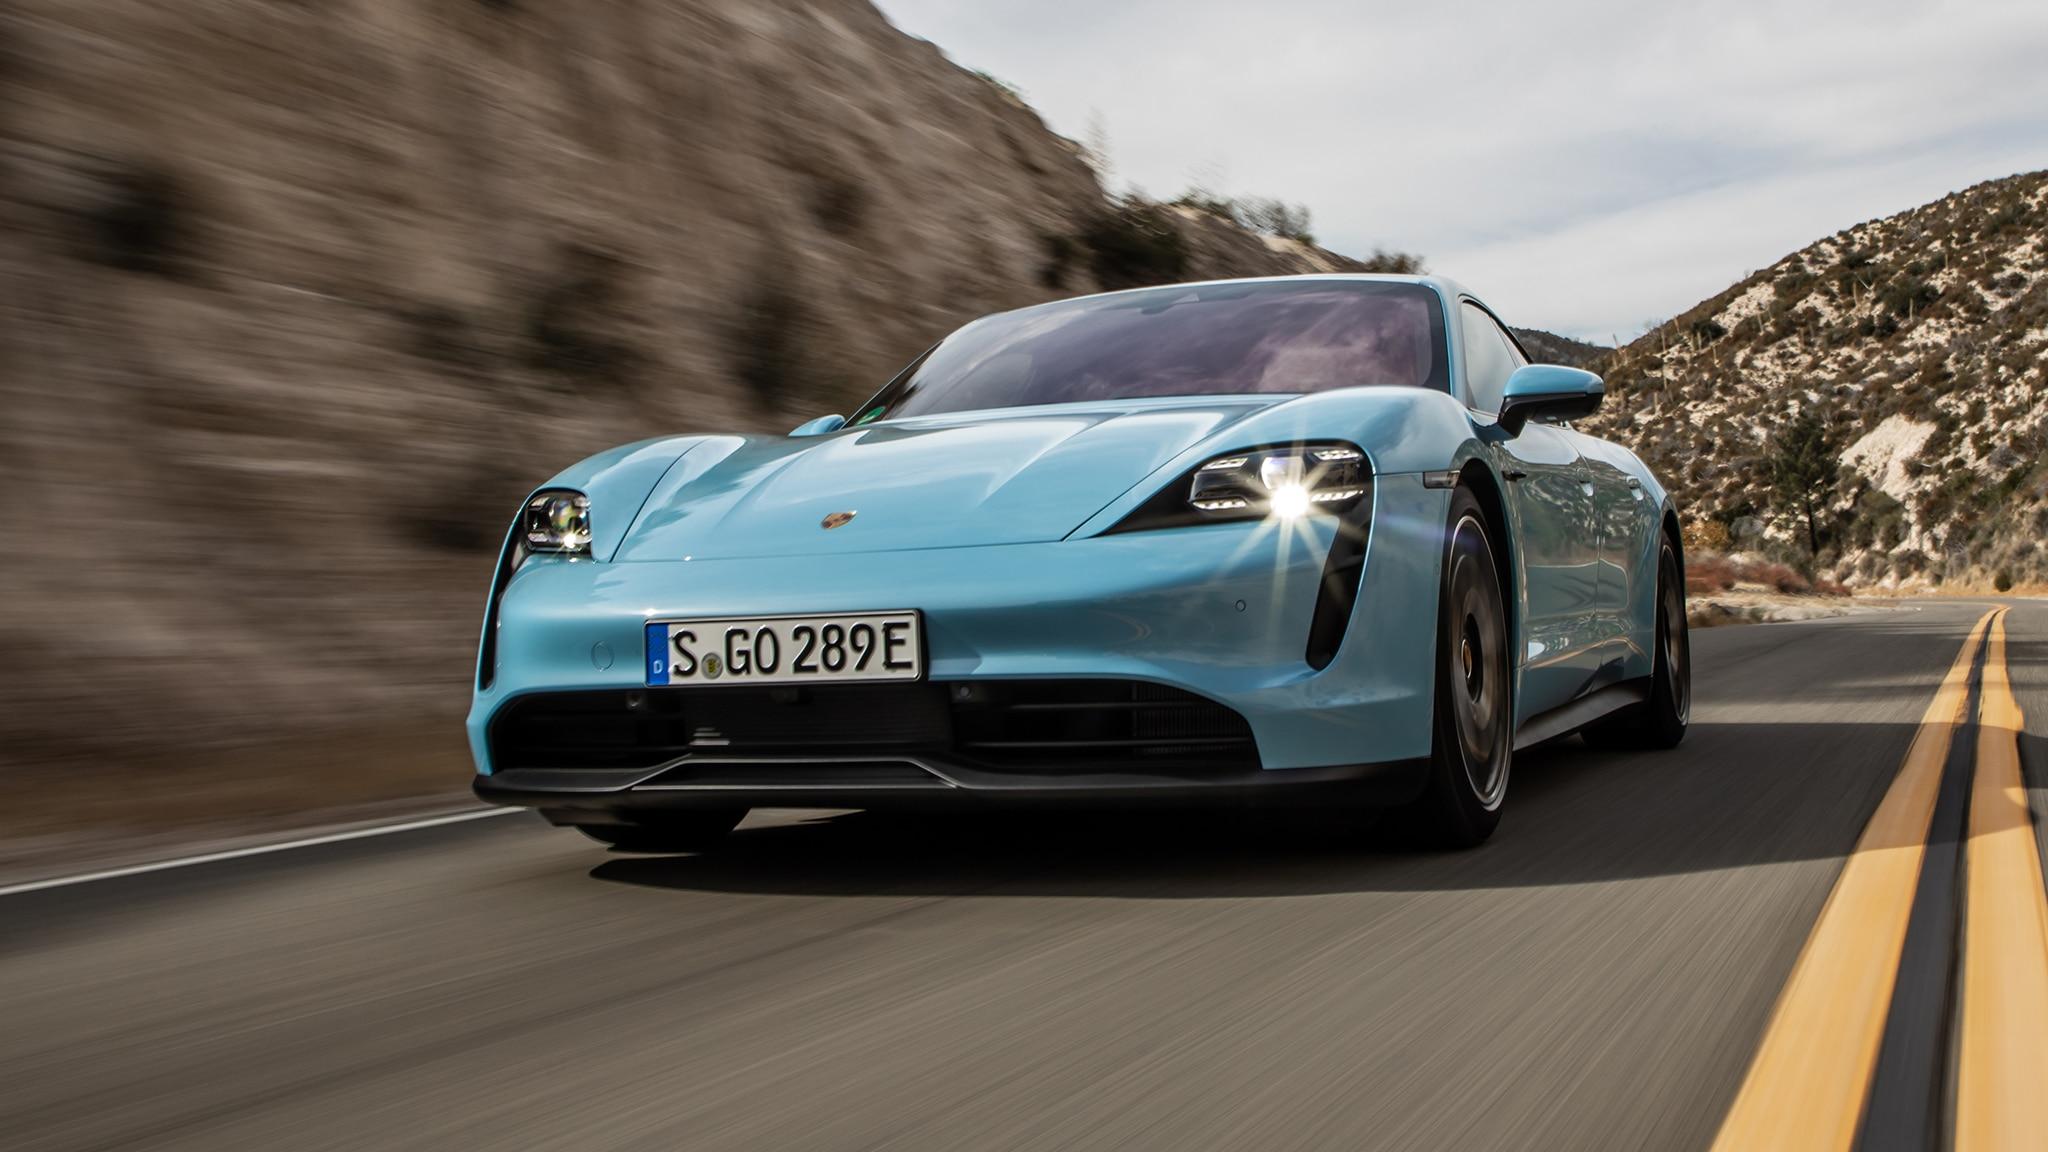 2020 Porsche Taycan 4s Review A Fast Silent Go In Stuttgart S Lowliest Ev